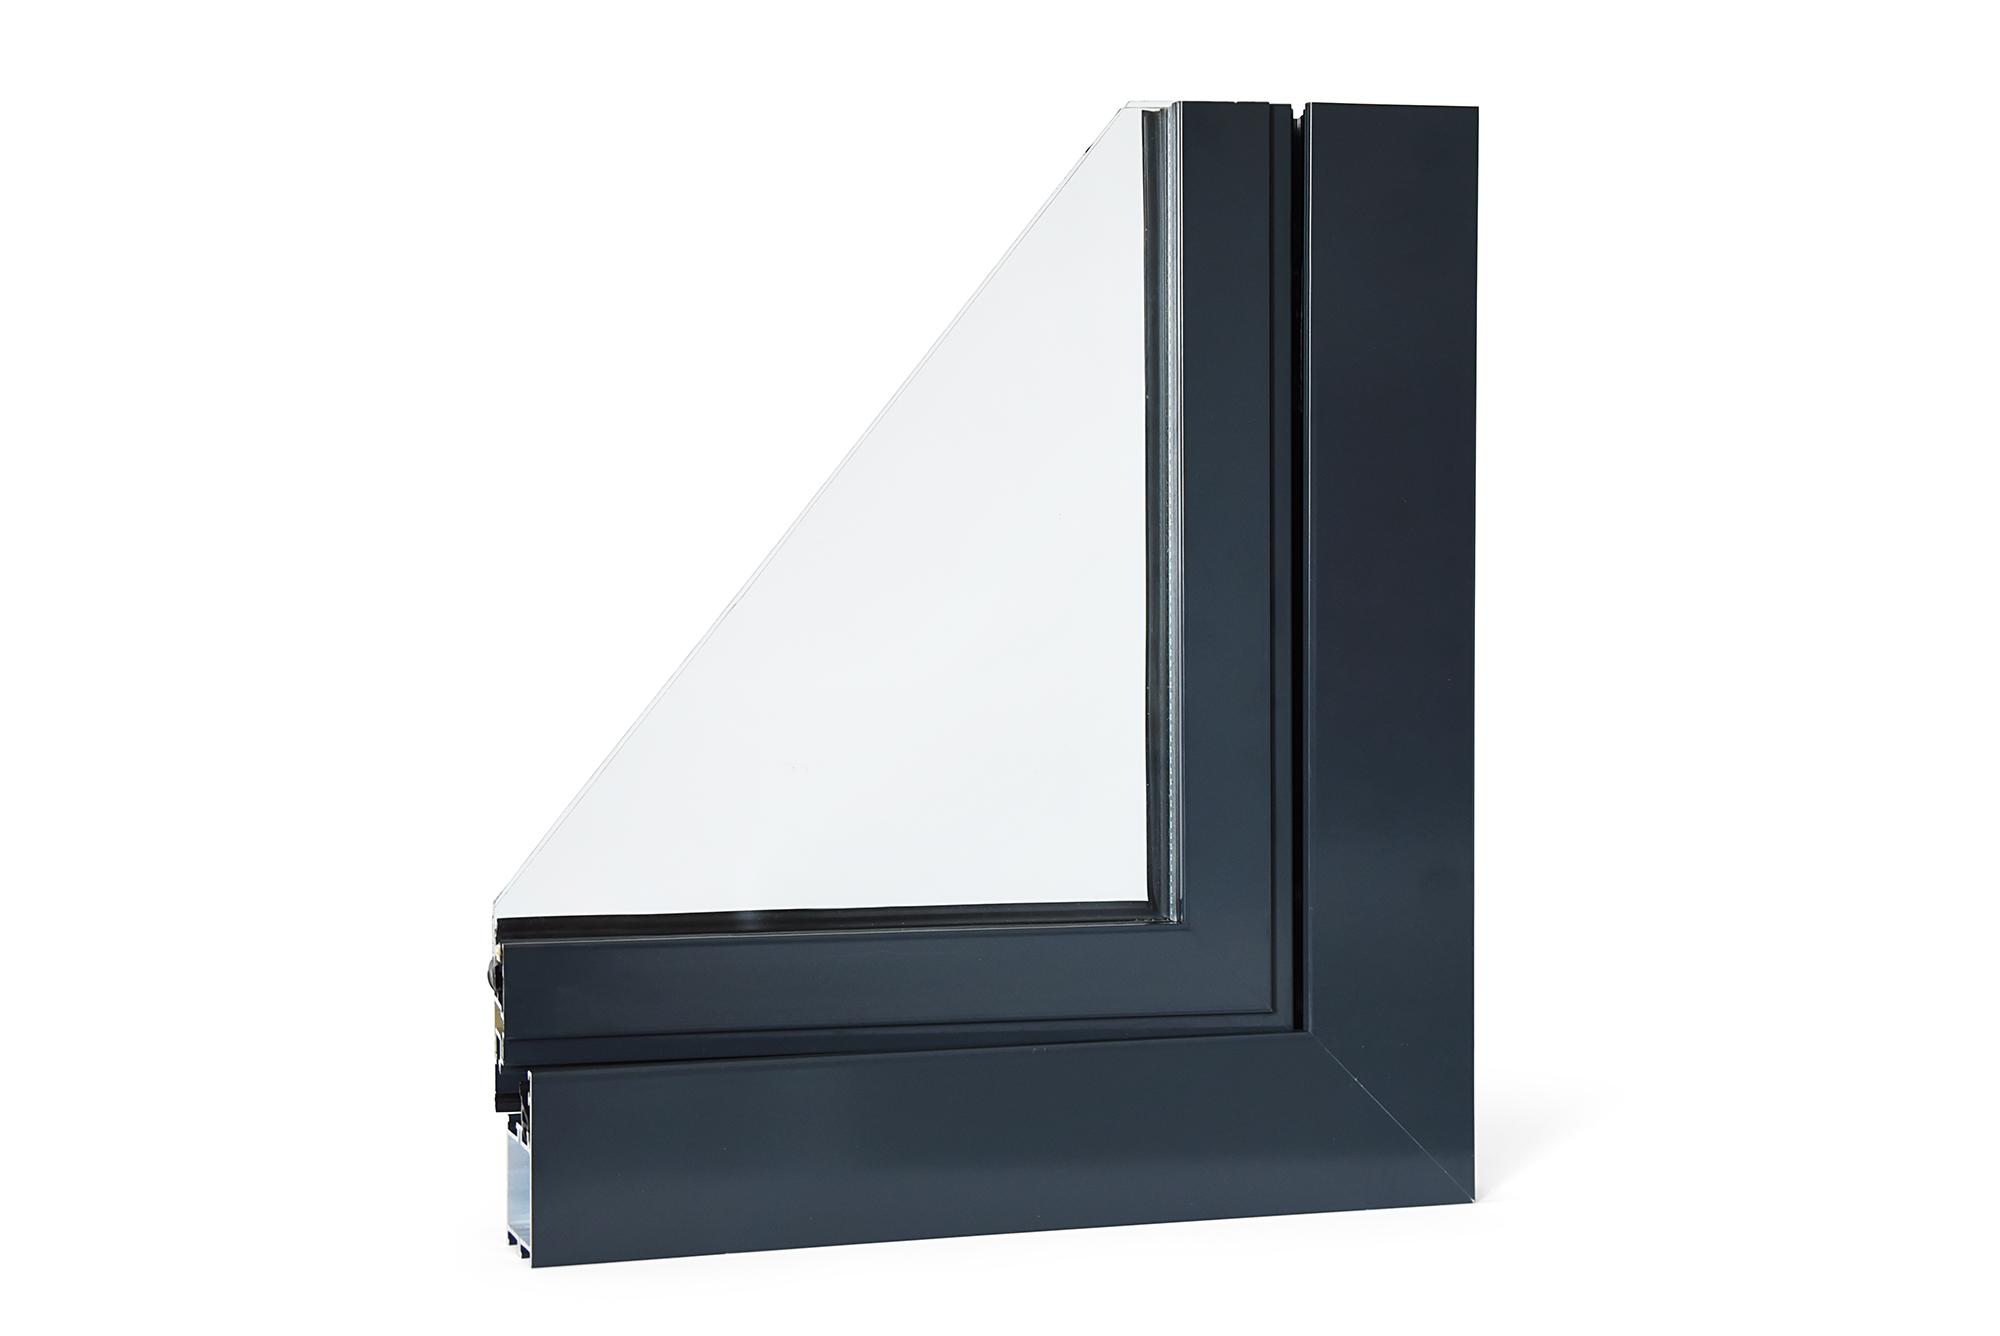 aluminiumfenster drutex alu mb 45 fenster dreh kipp wei. Black Bedroom Furniture Sets. Home Design Ideas